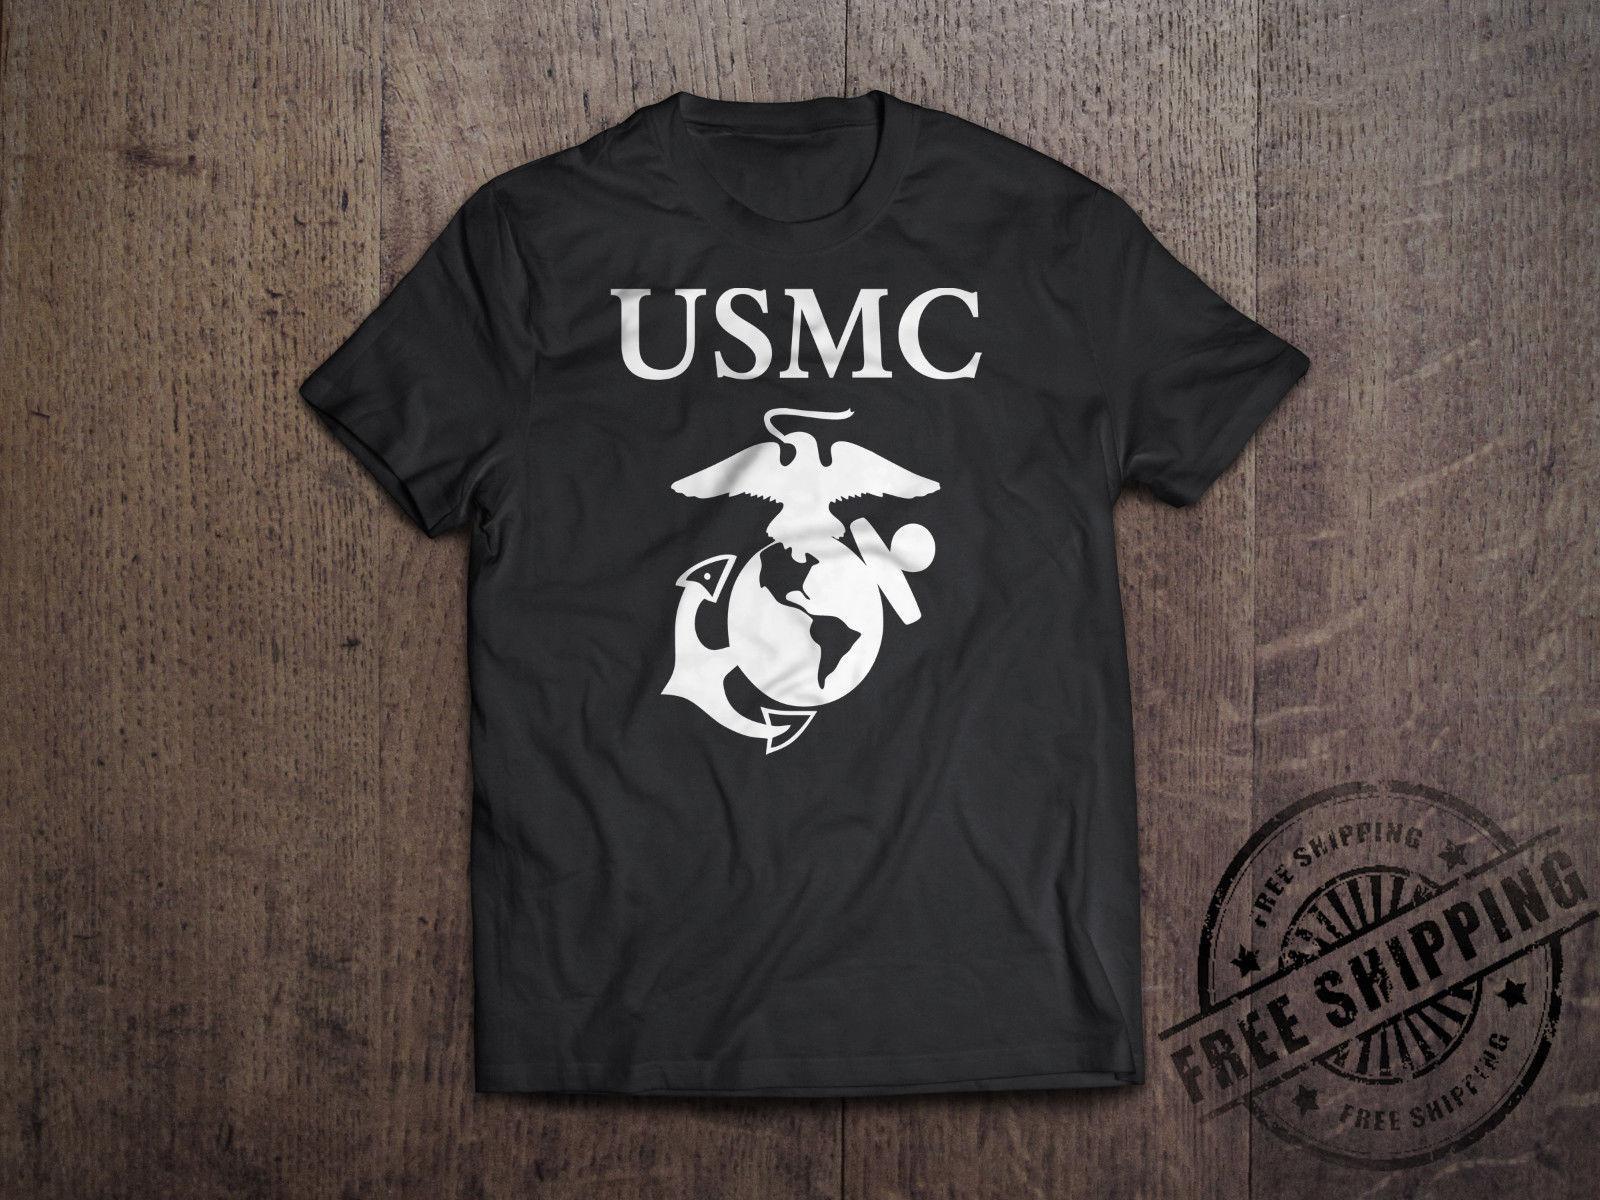 Usmc T Shirt The Few The Proud Usmc Tee Marine Corps Shirt S